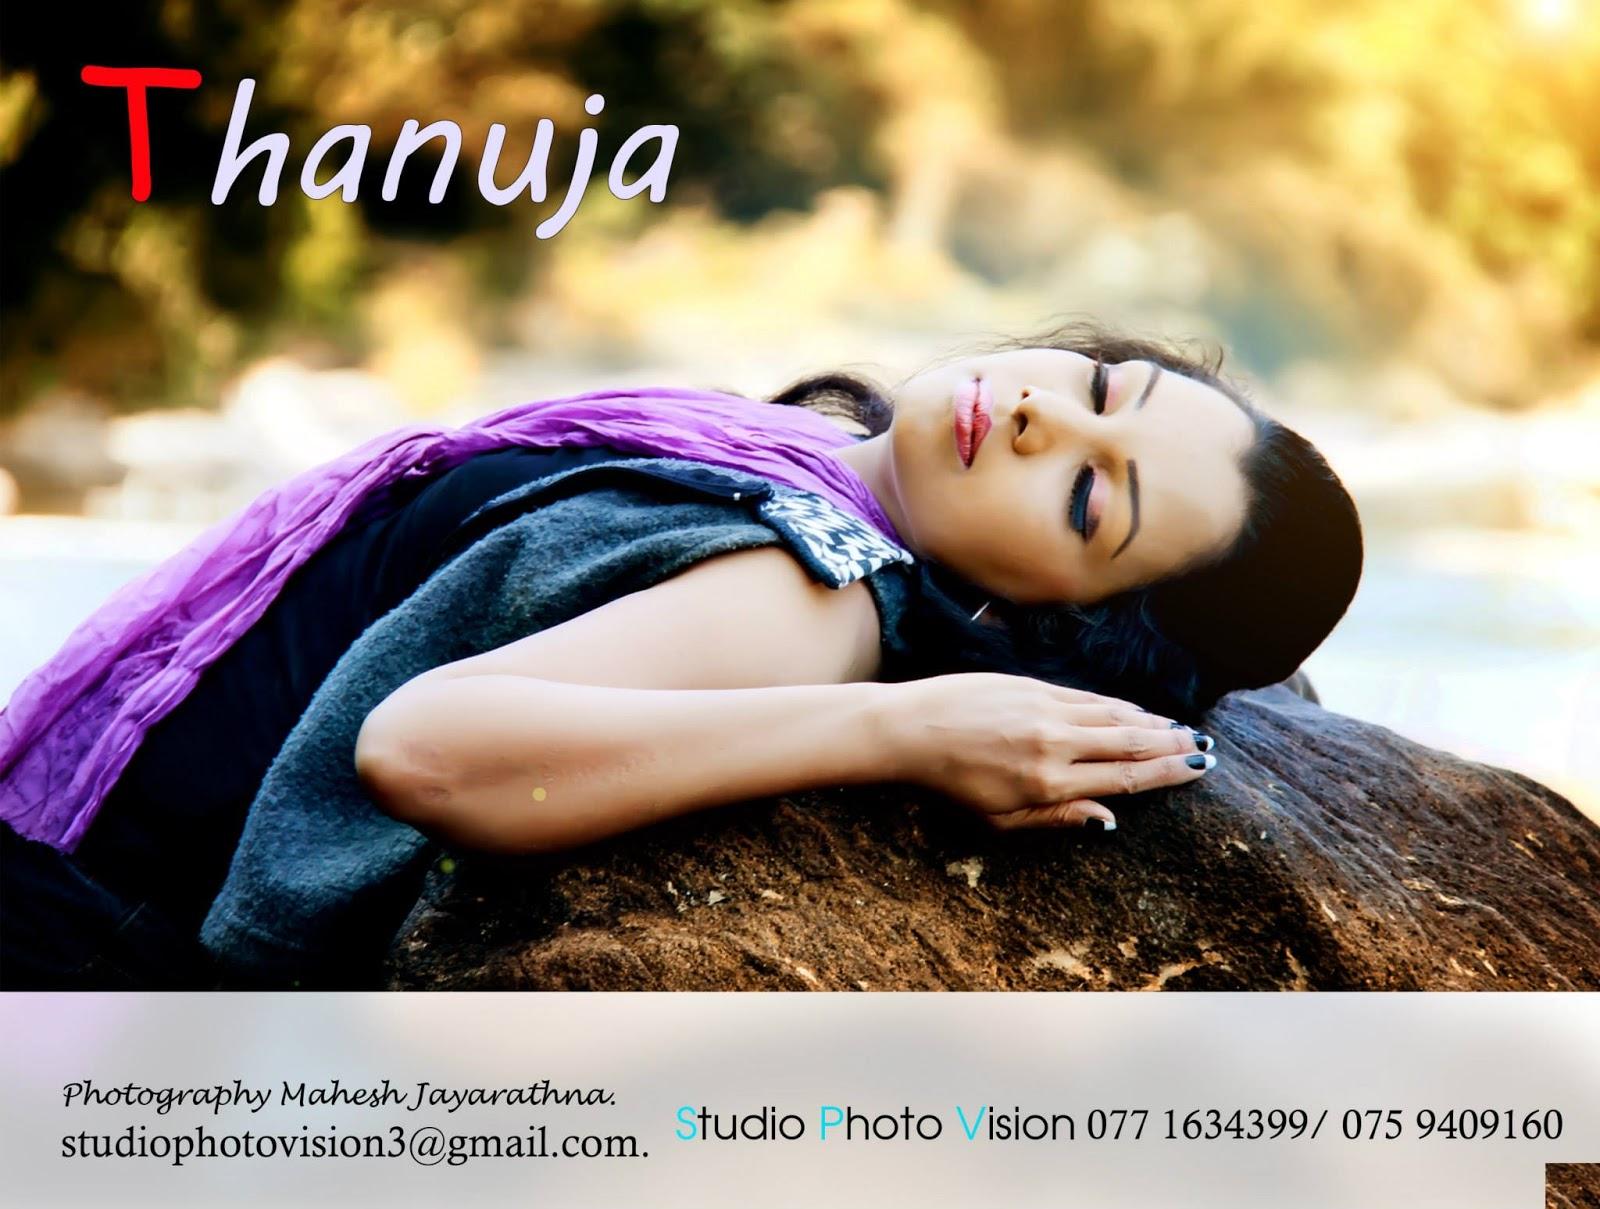 StudioPhotoVision photography mahesh jayarathna